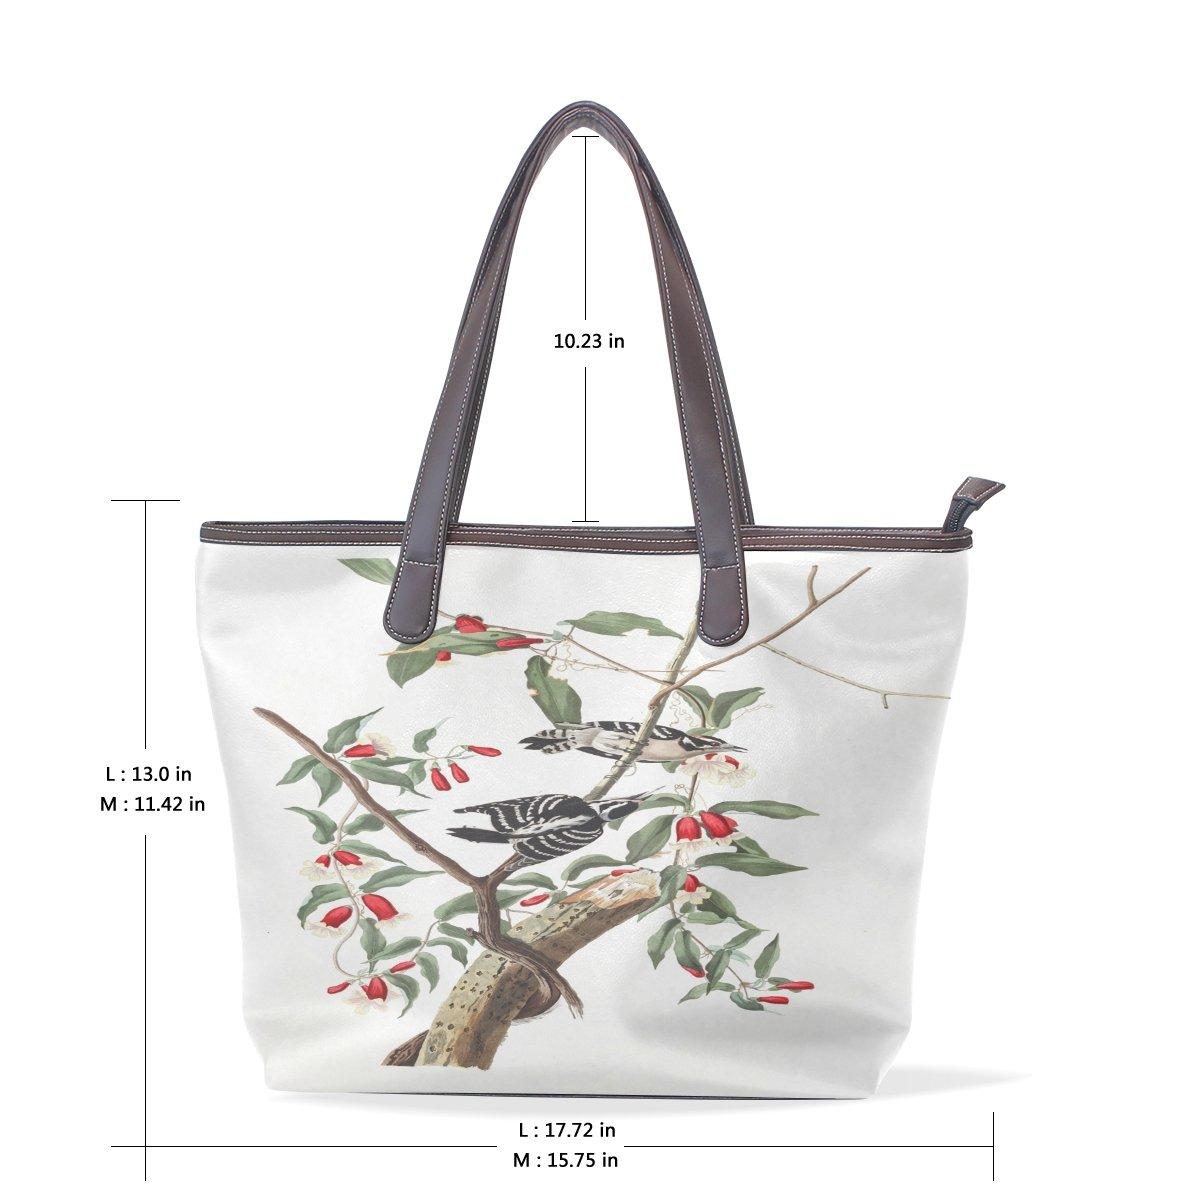 Mr.Weng Household Plate Downy Woodpecker Lady Handbag Tote Bag Zipper Shoulder Bag